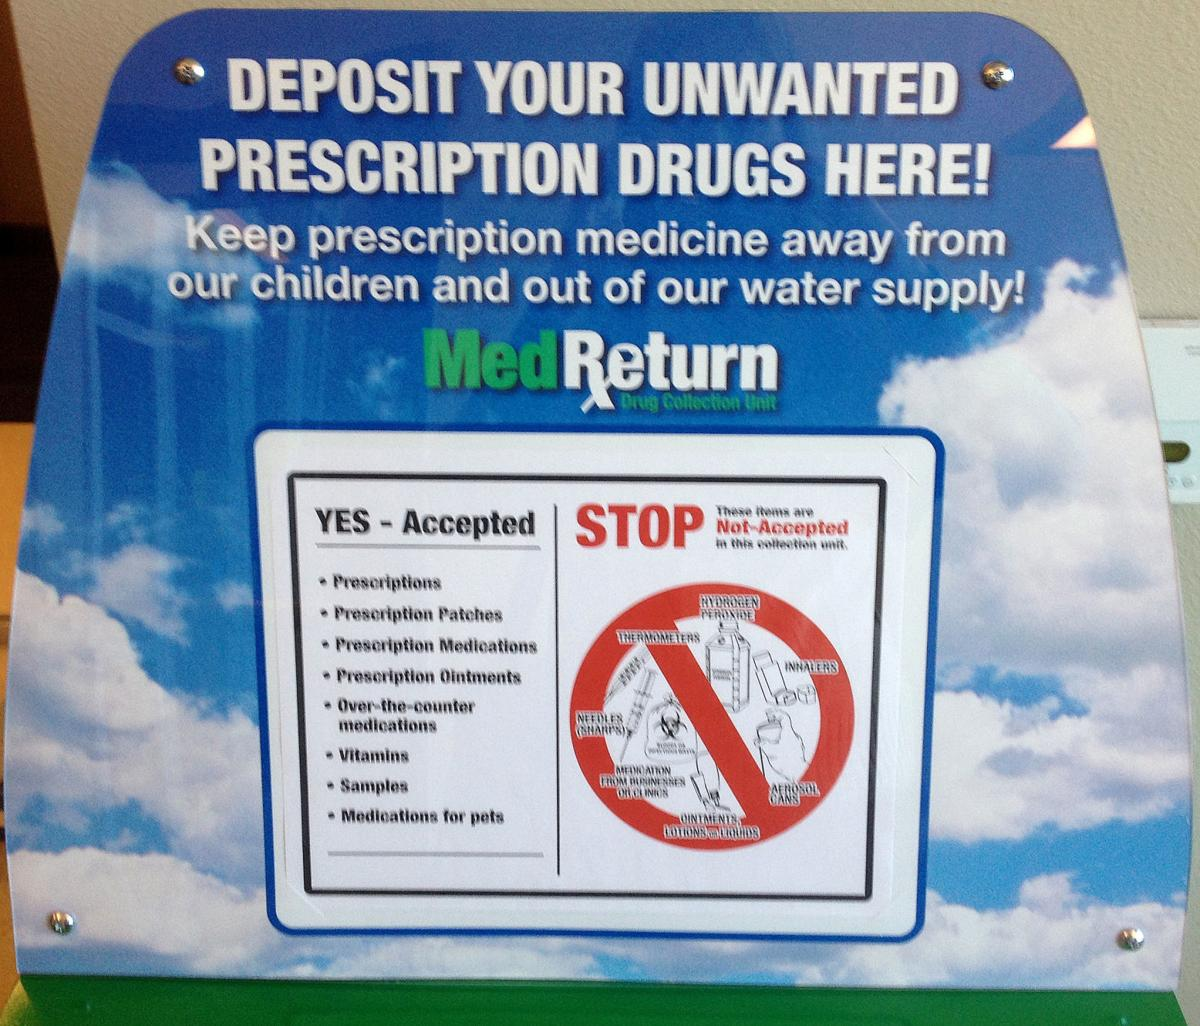 DRUG COLLECTION BOX